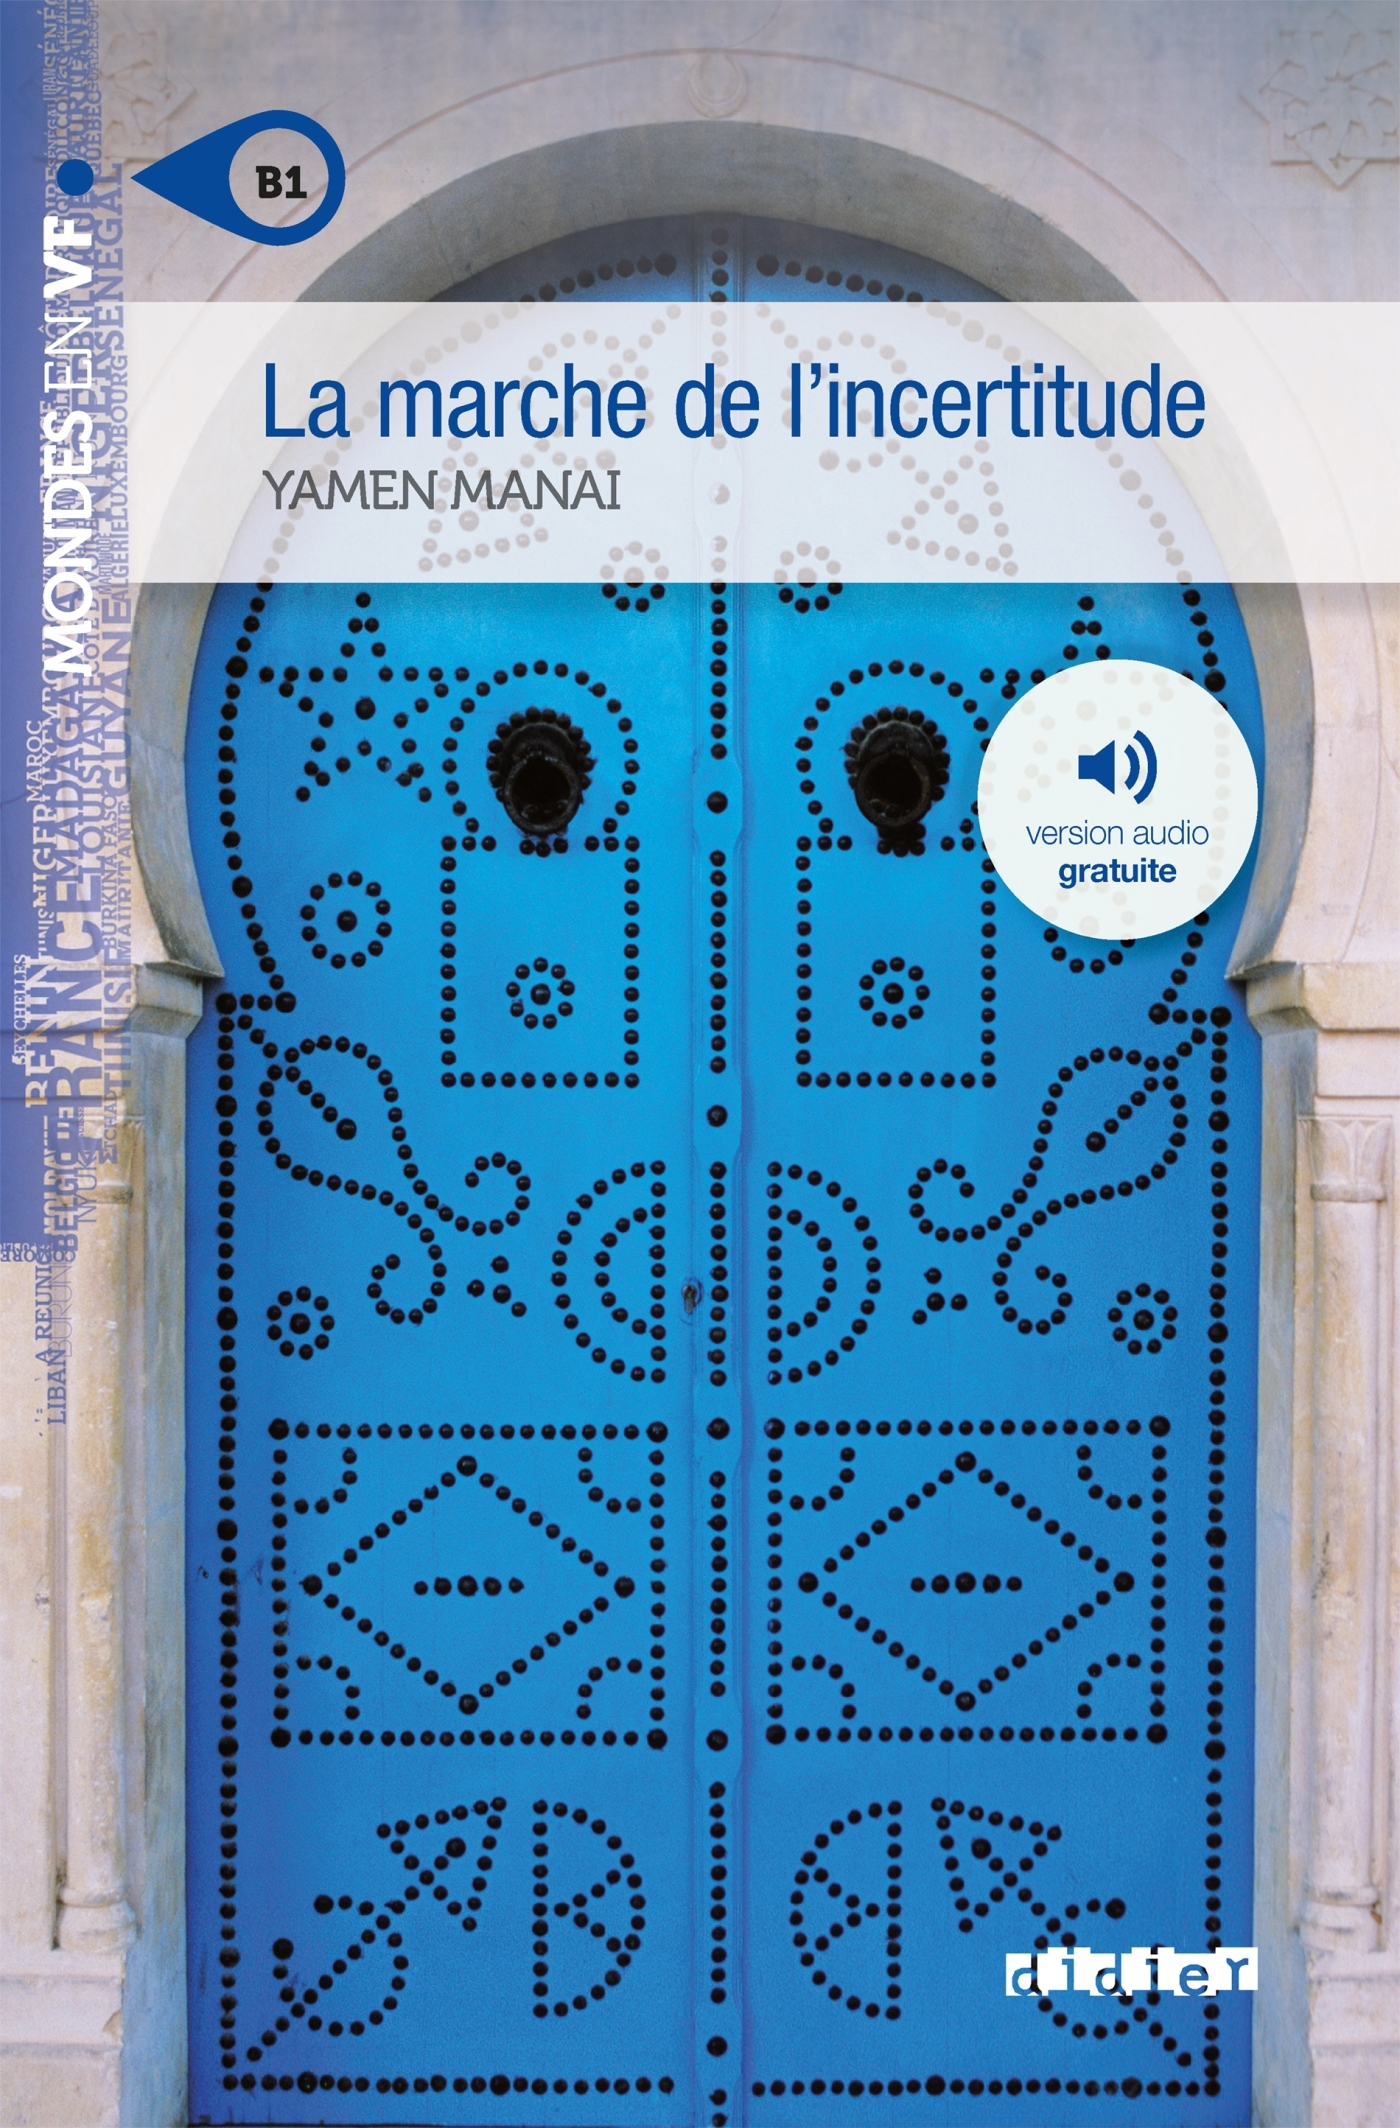 LA MARCHE DE L'INCERTITUDE NIV. B1  - LIVRE + MP3